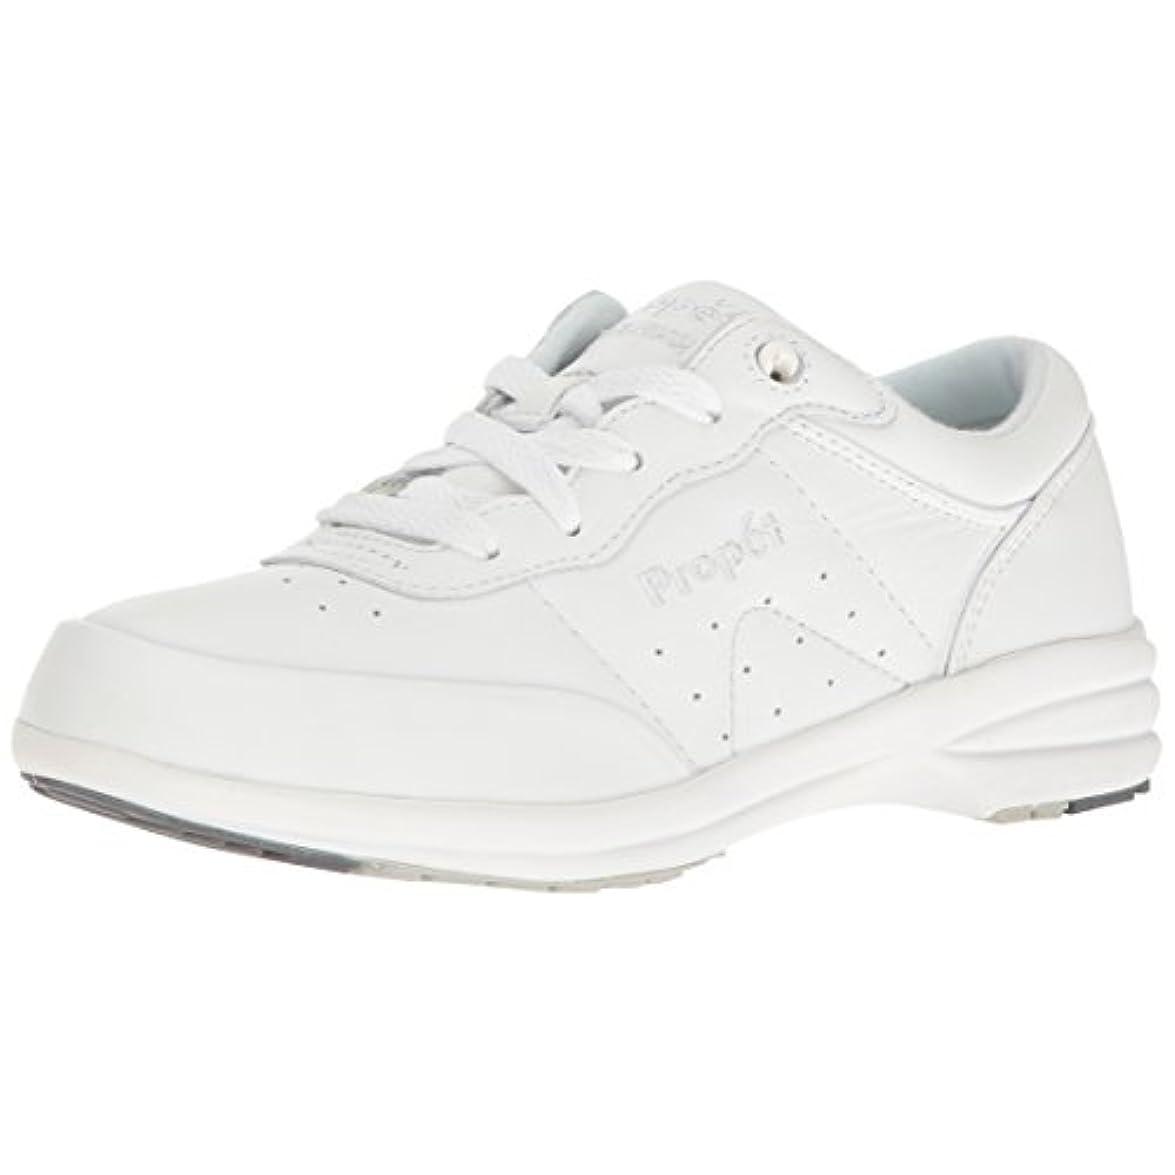 Propét W3840 Sneaker Da Donna Misura M Bronzo bianco 36 5 N Eu